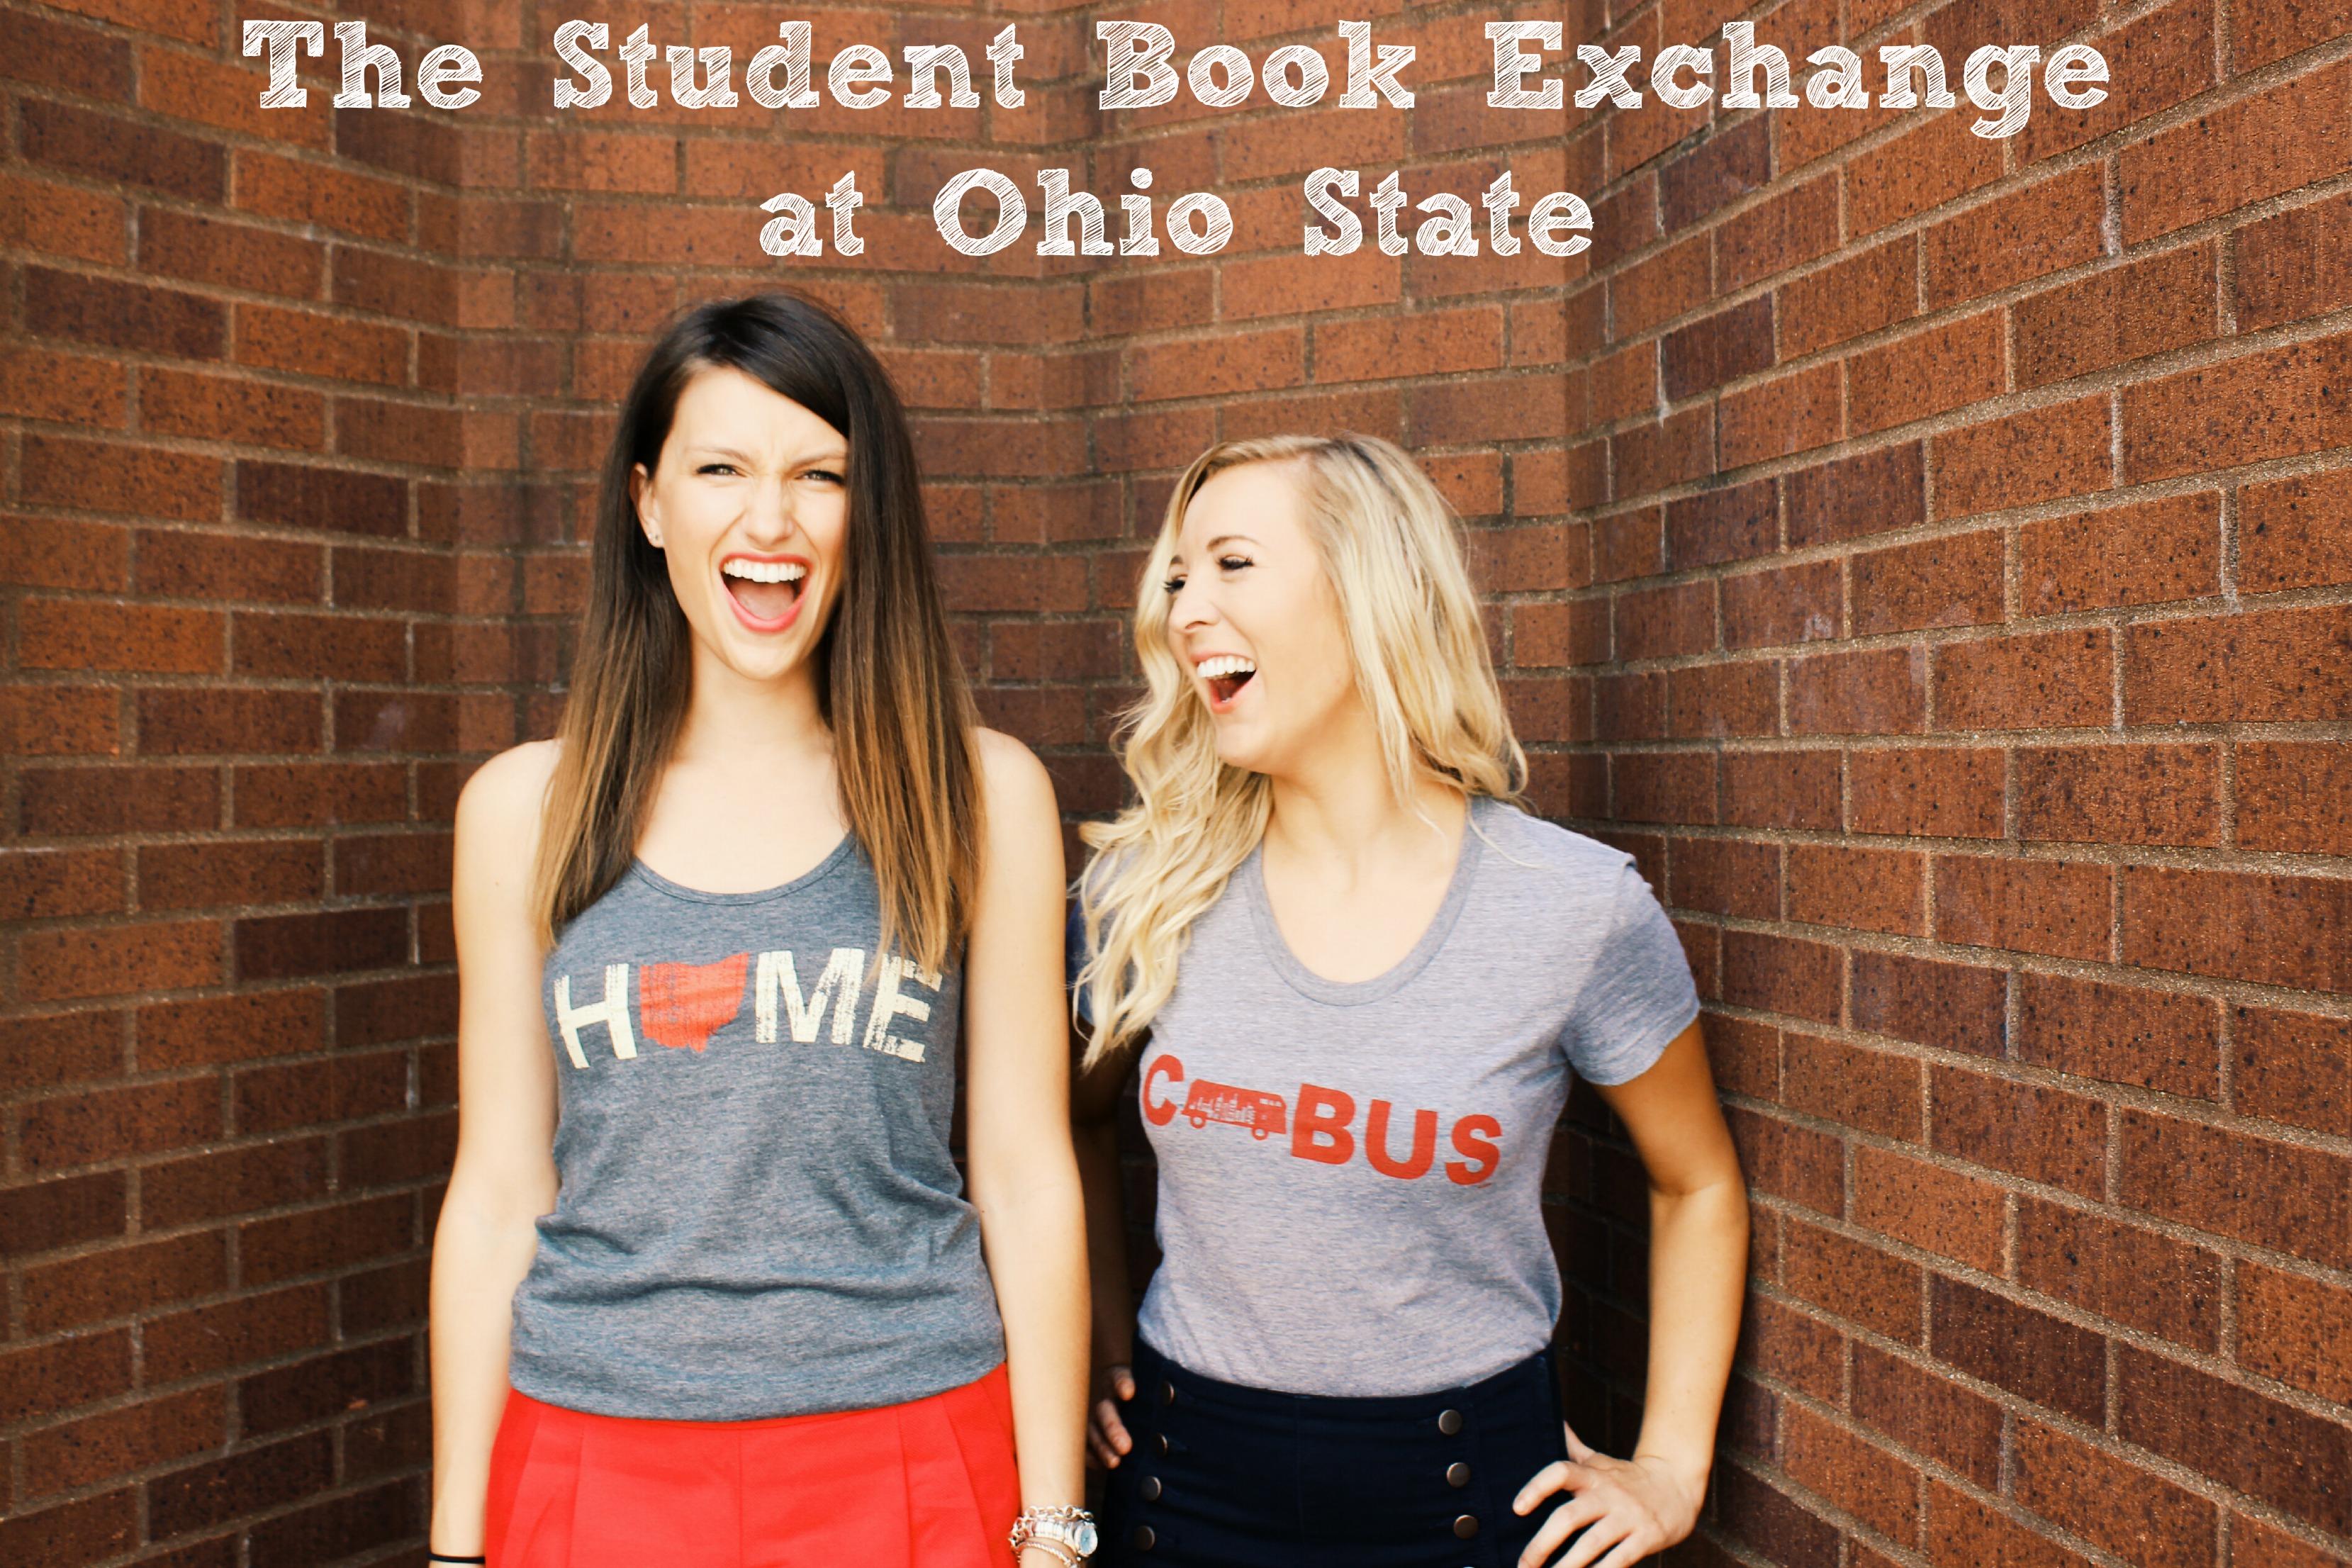 The Student Book Exchange Sweepstakes